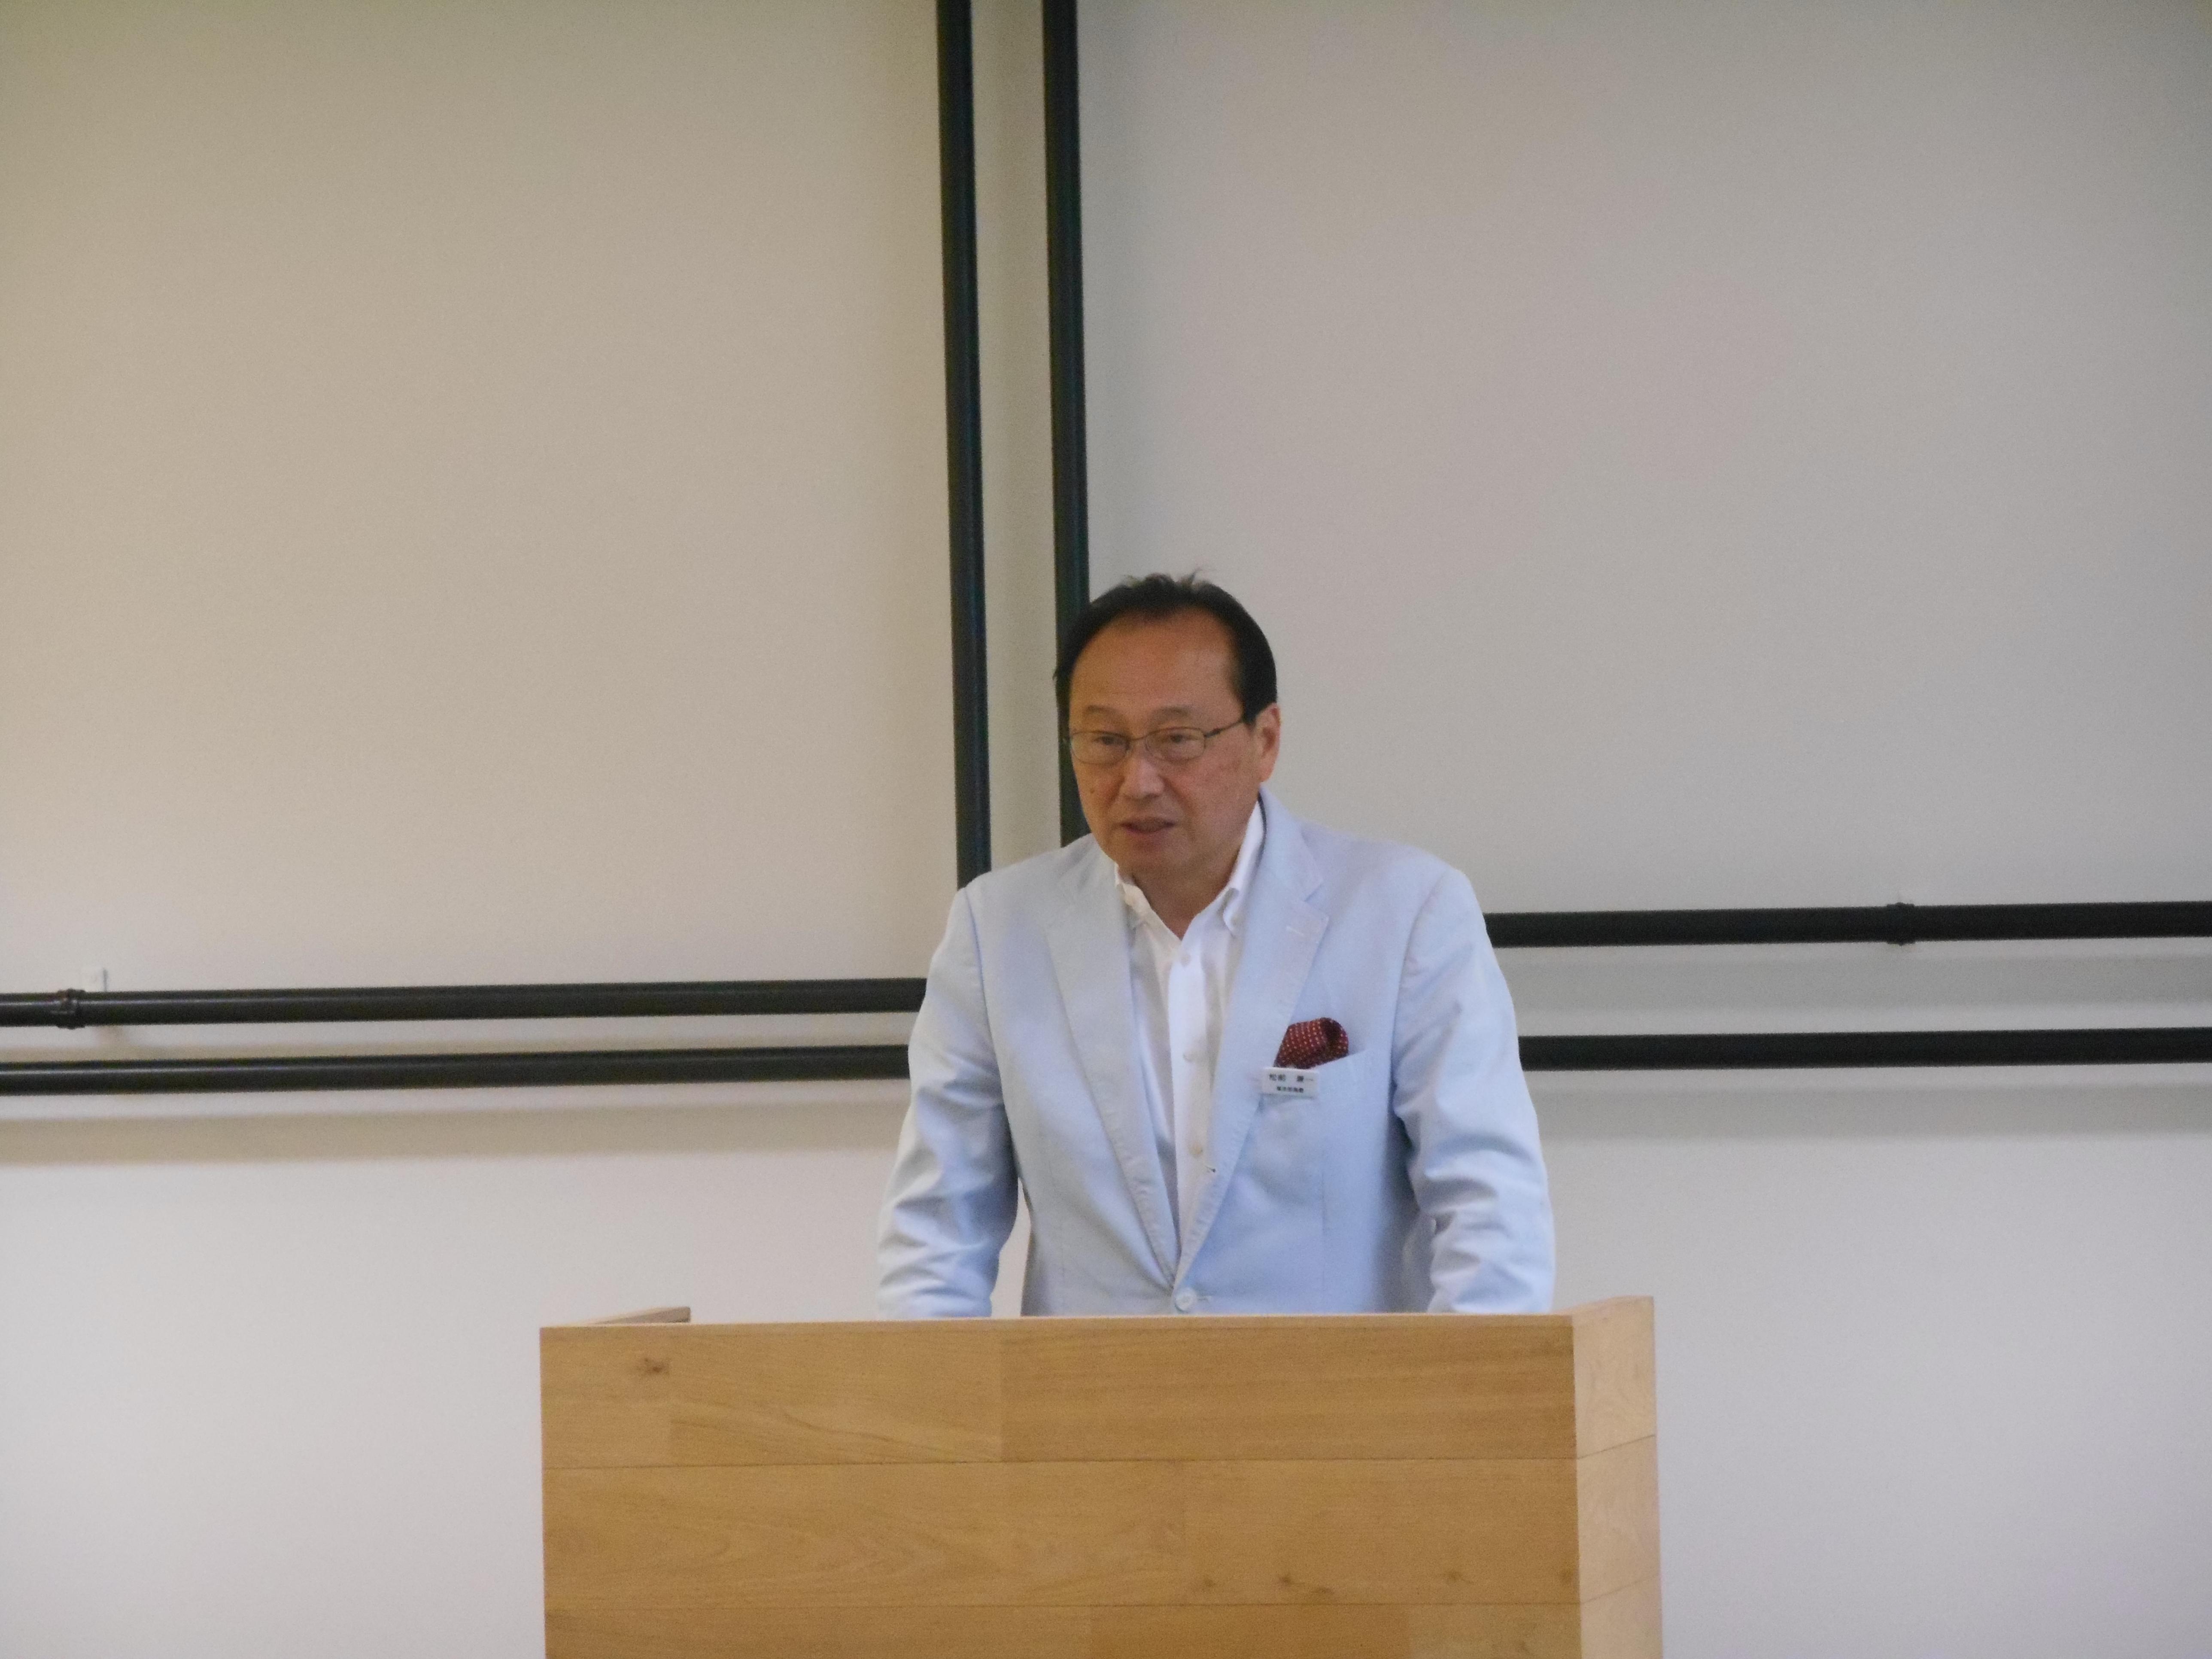 DSCN3697 1 - 4月1日東京思風塾の開催になります。